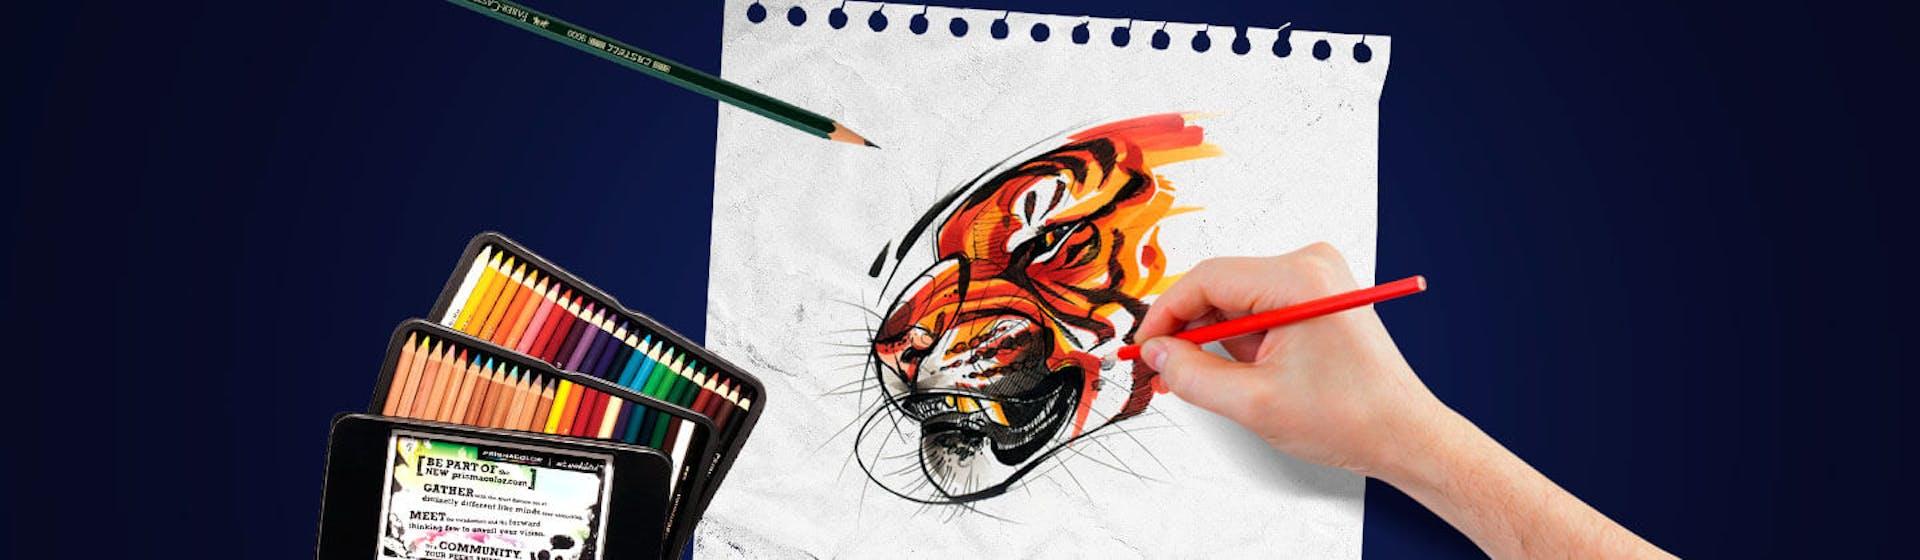 ¡Aprende estas simples técnicas para dibujar a lápiz como un profesional!